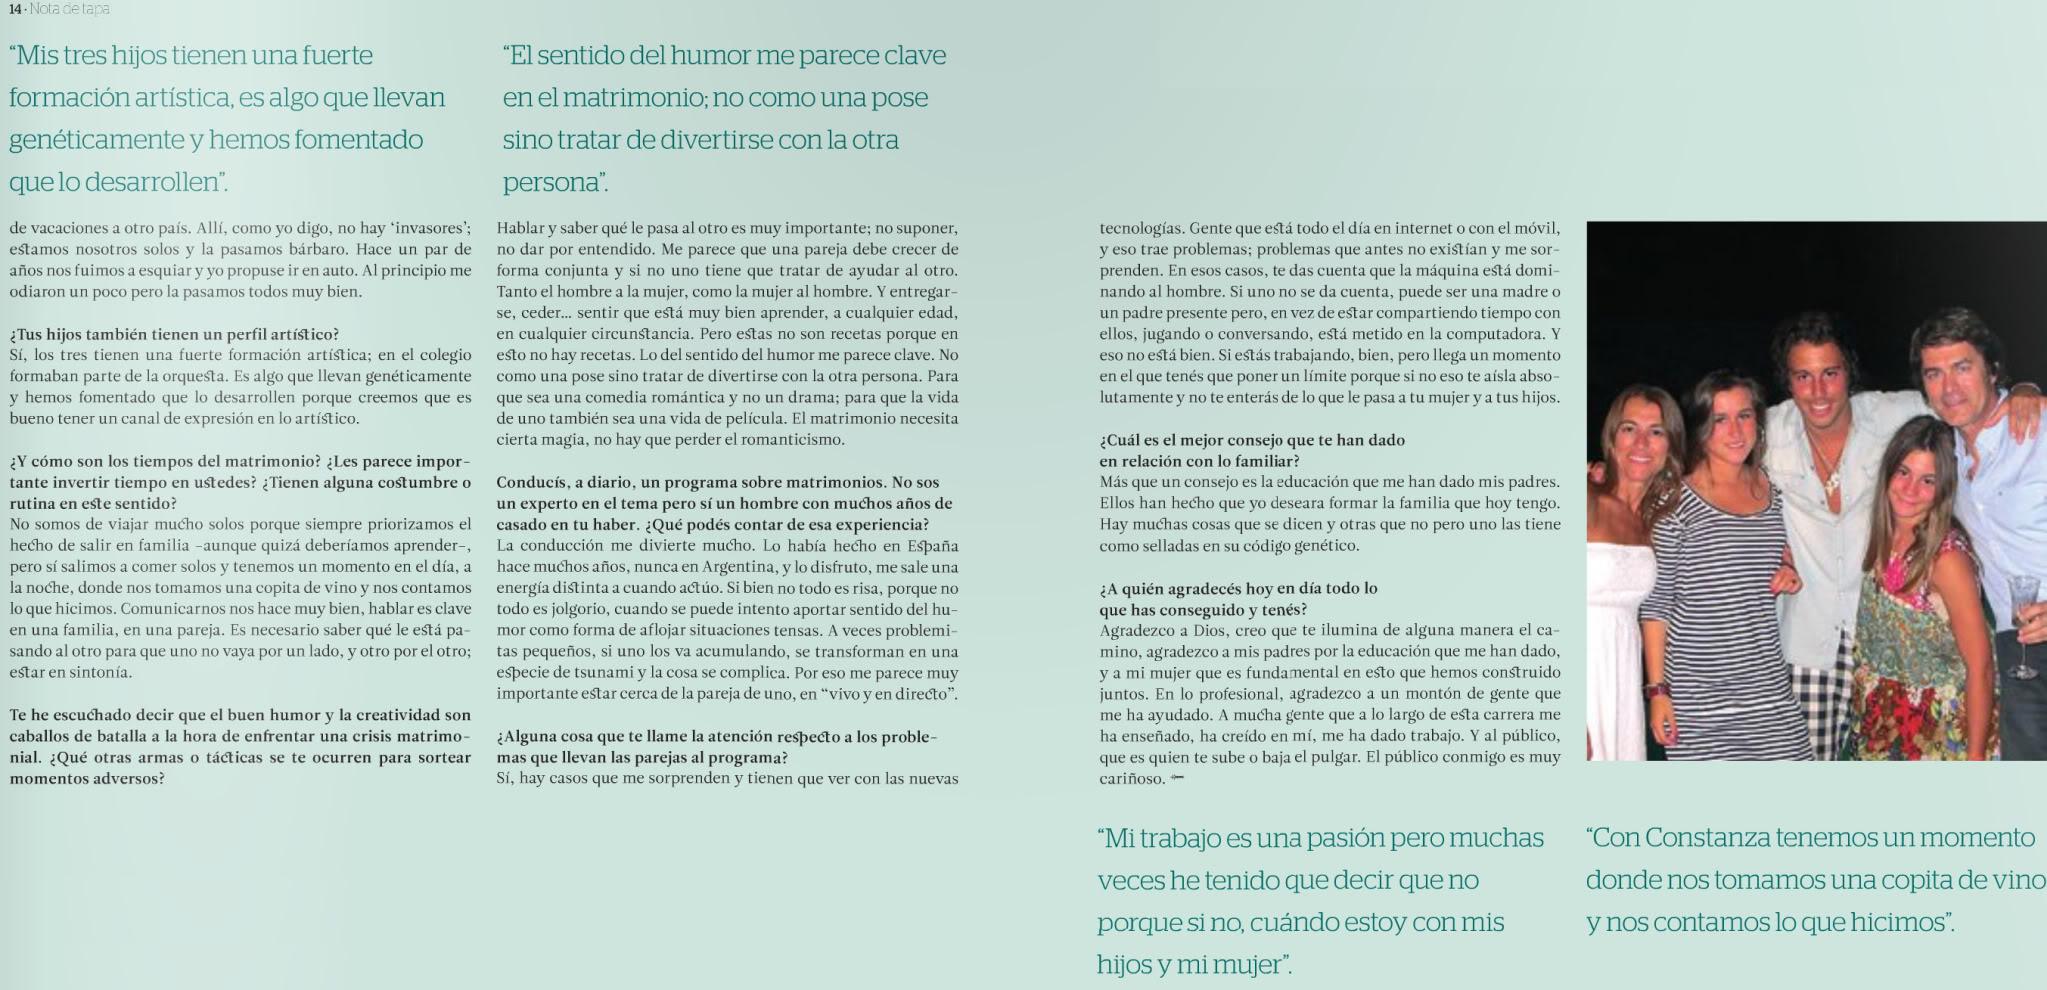 Габриэль Коррадо / Gabriel Corrado - Página 13 Familia_hoy004